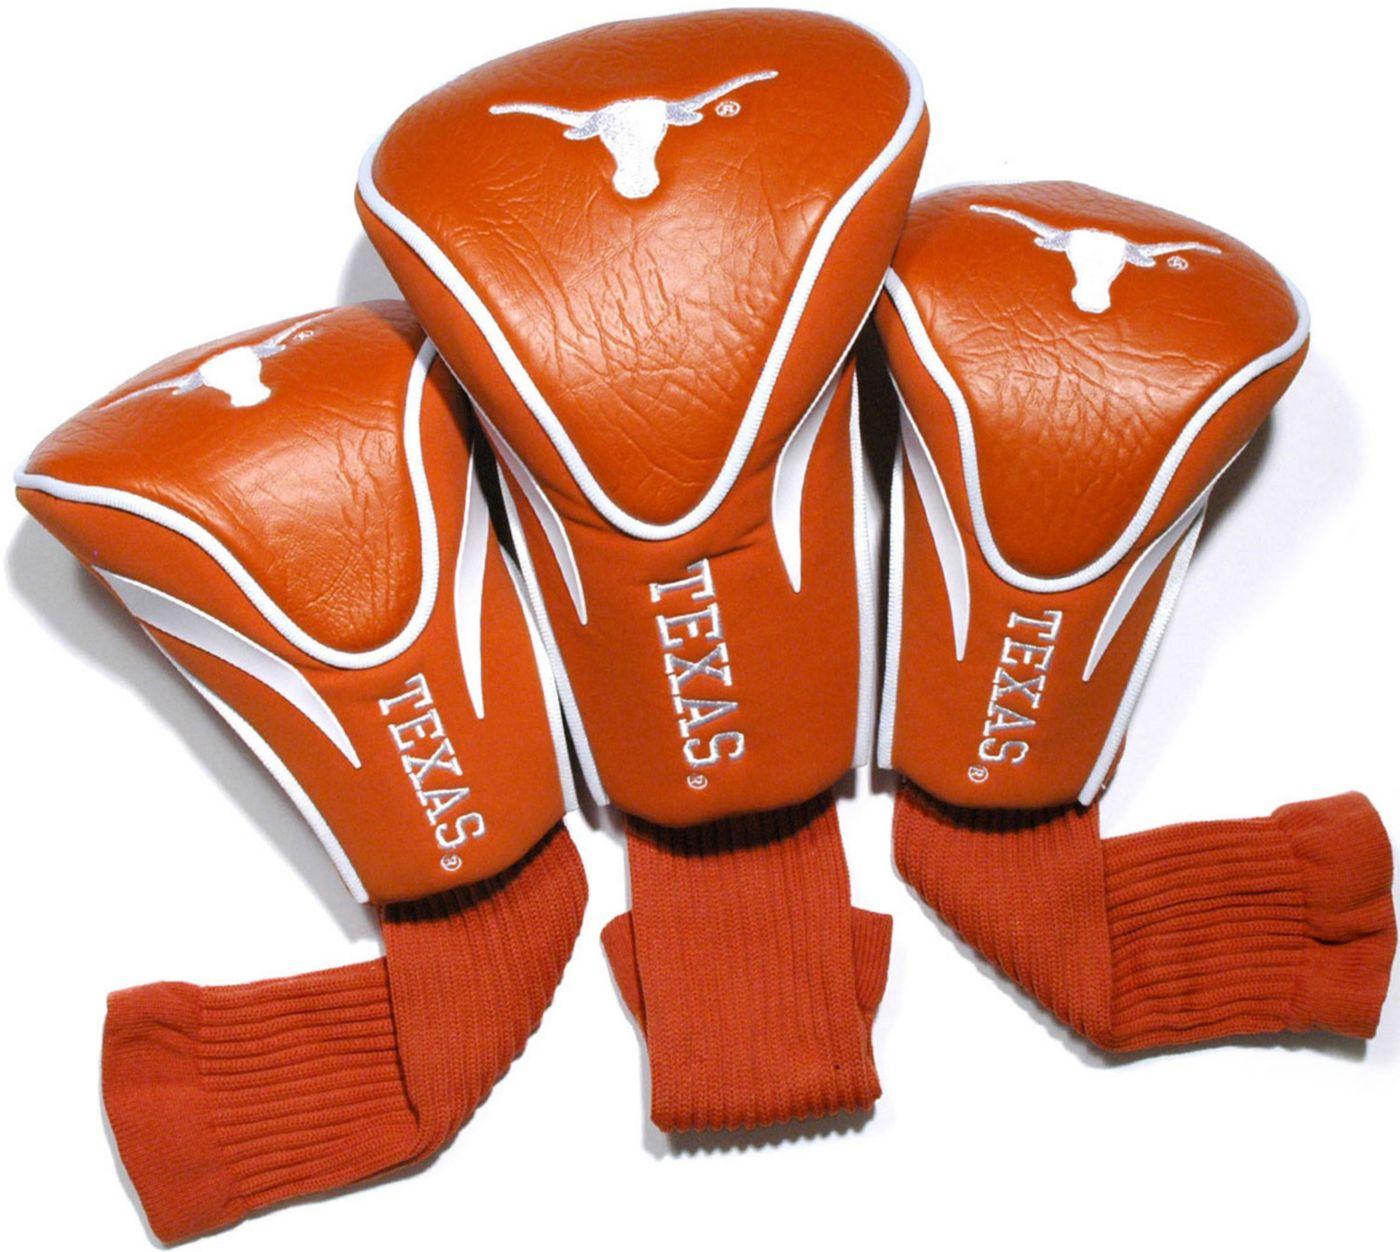 Team Golf Texas Longhorns Contour Sock Headcovers - 3 Pack